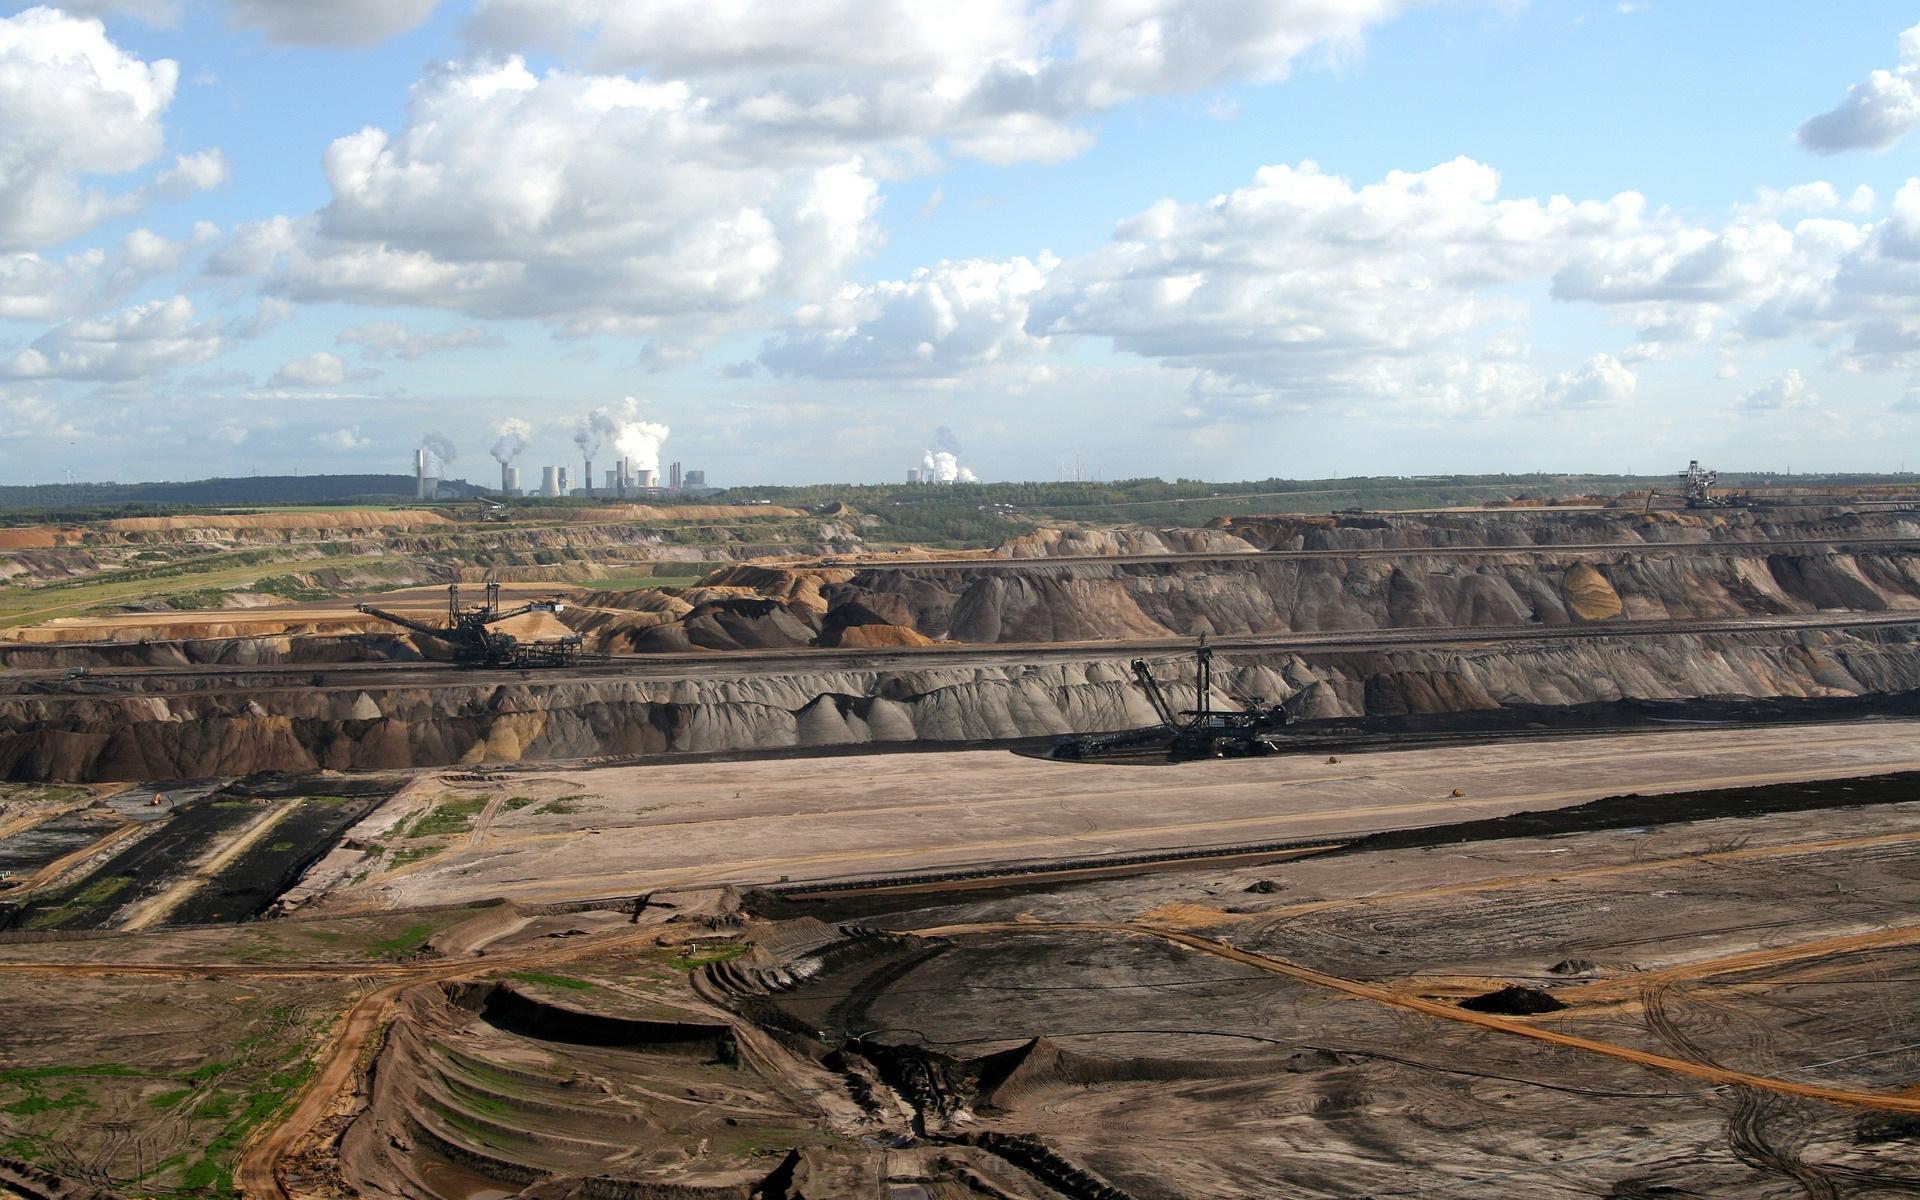 Braunkohle Tagebau Bergwerk Kohleabbau Wüste Vernichtung Klimakiller 111365